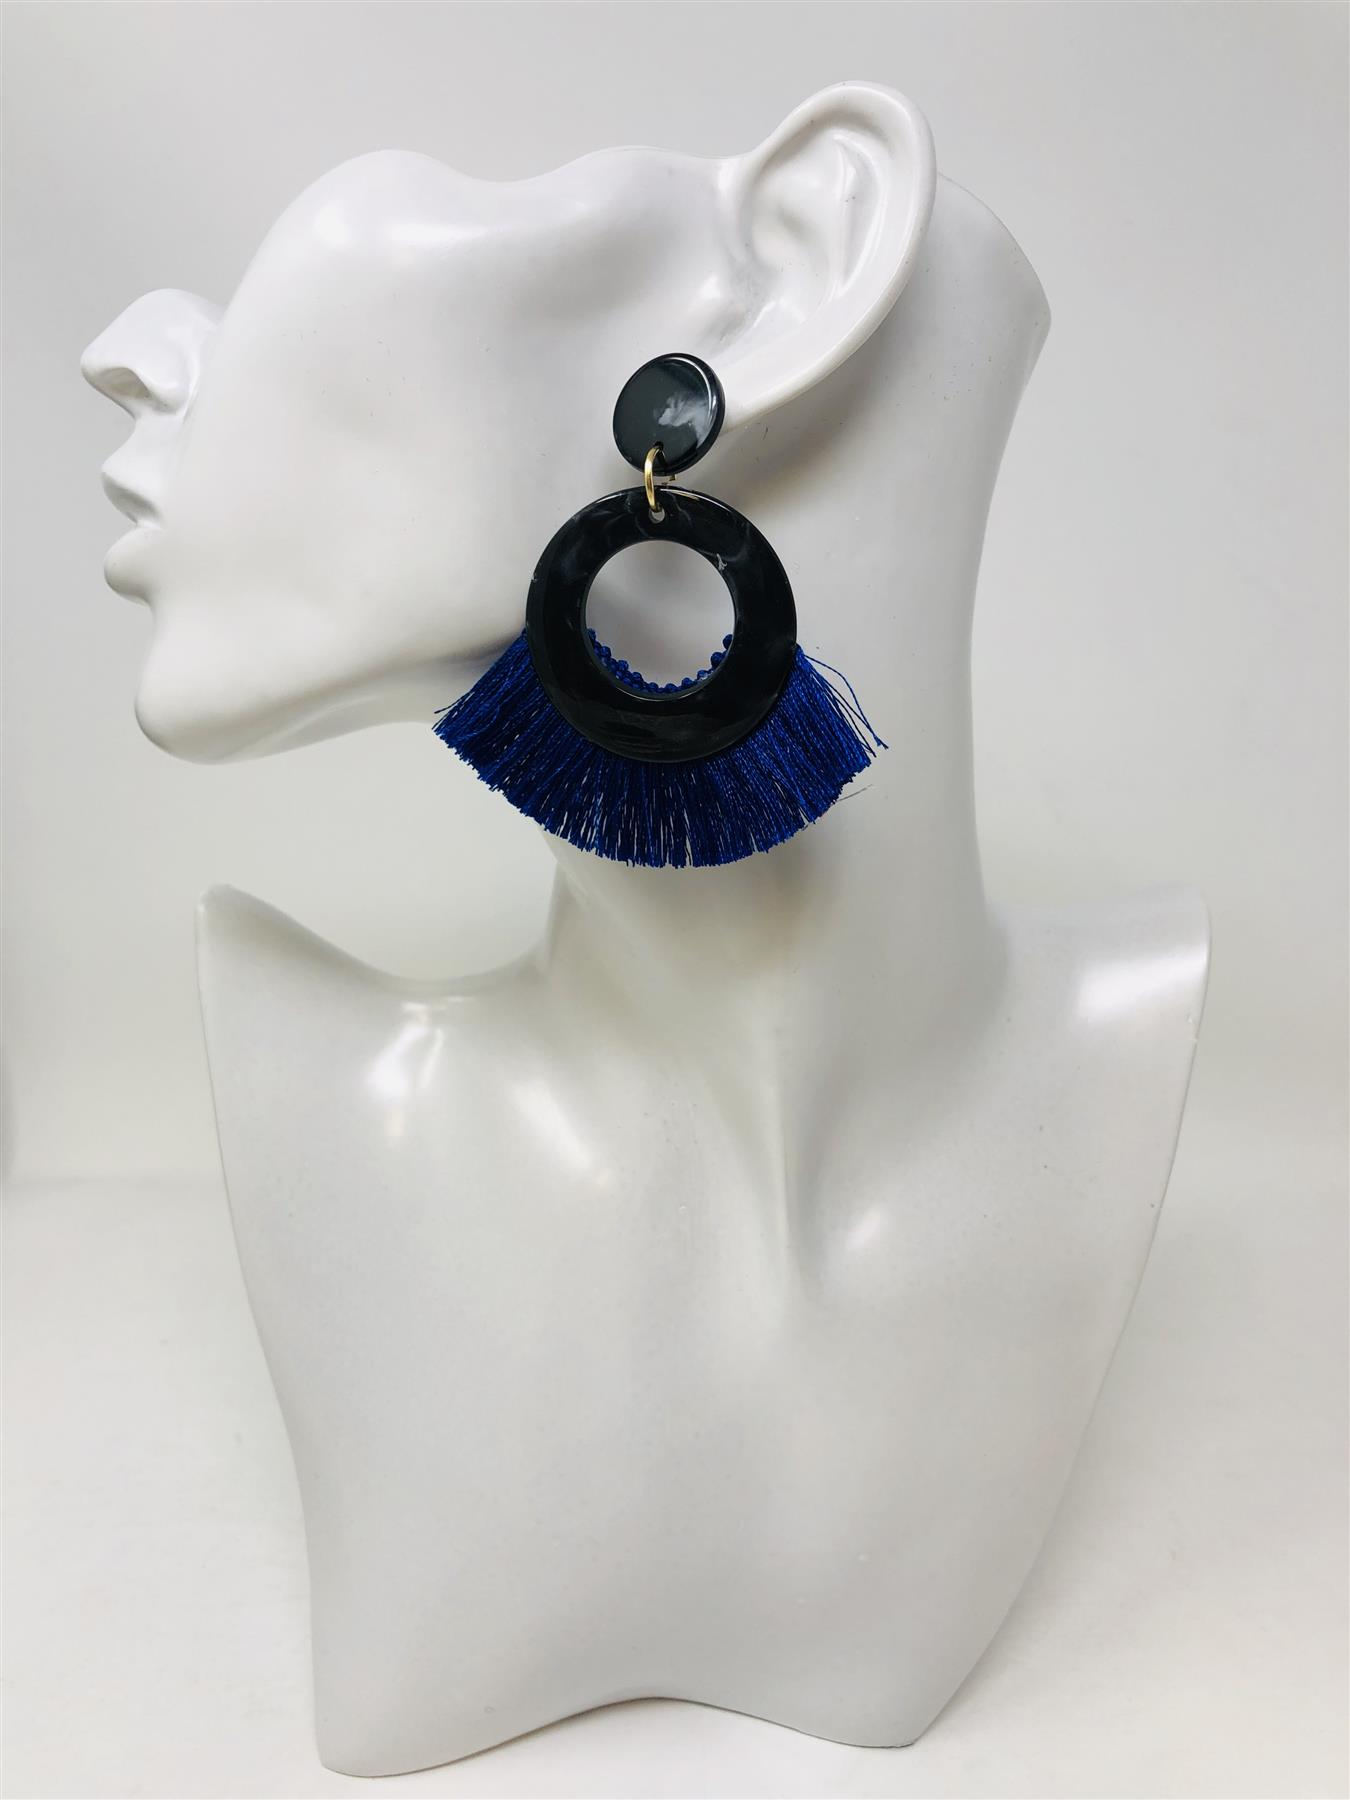 Women-Fashion-Rhinestone-Long-Tassel-Dangle-Earrings-Fringe-Drop-Jewelry-Gift-UK thumbnail 187